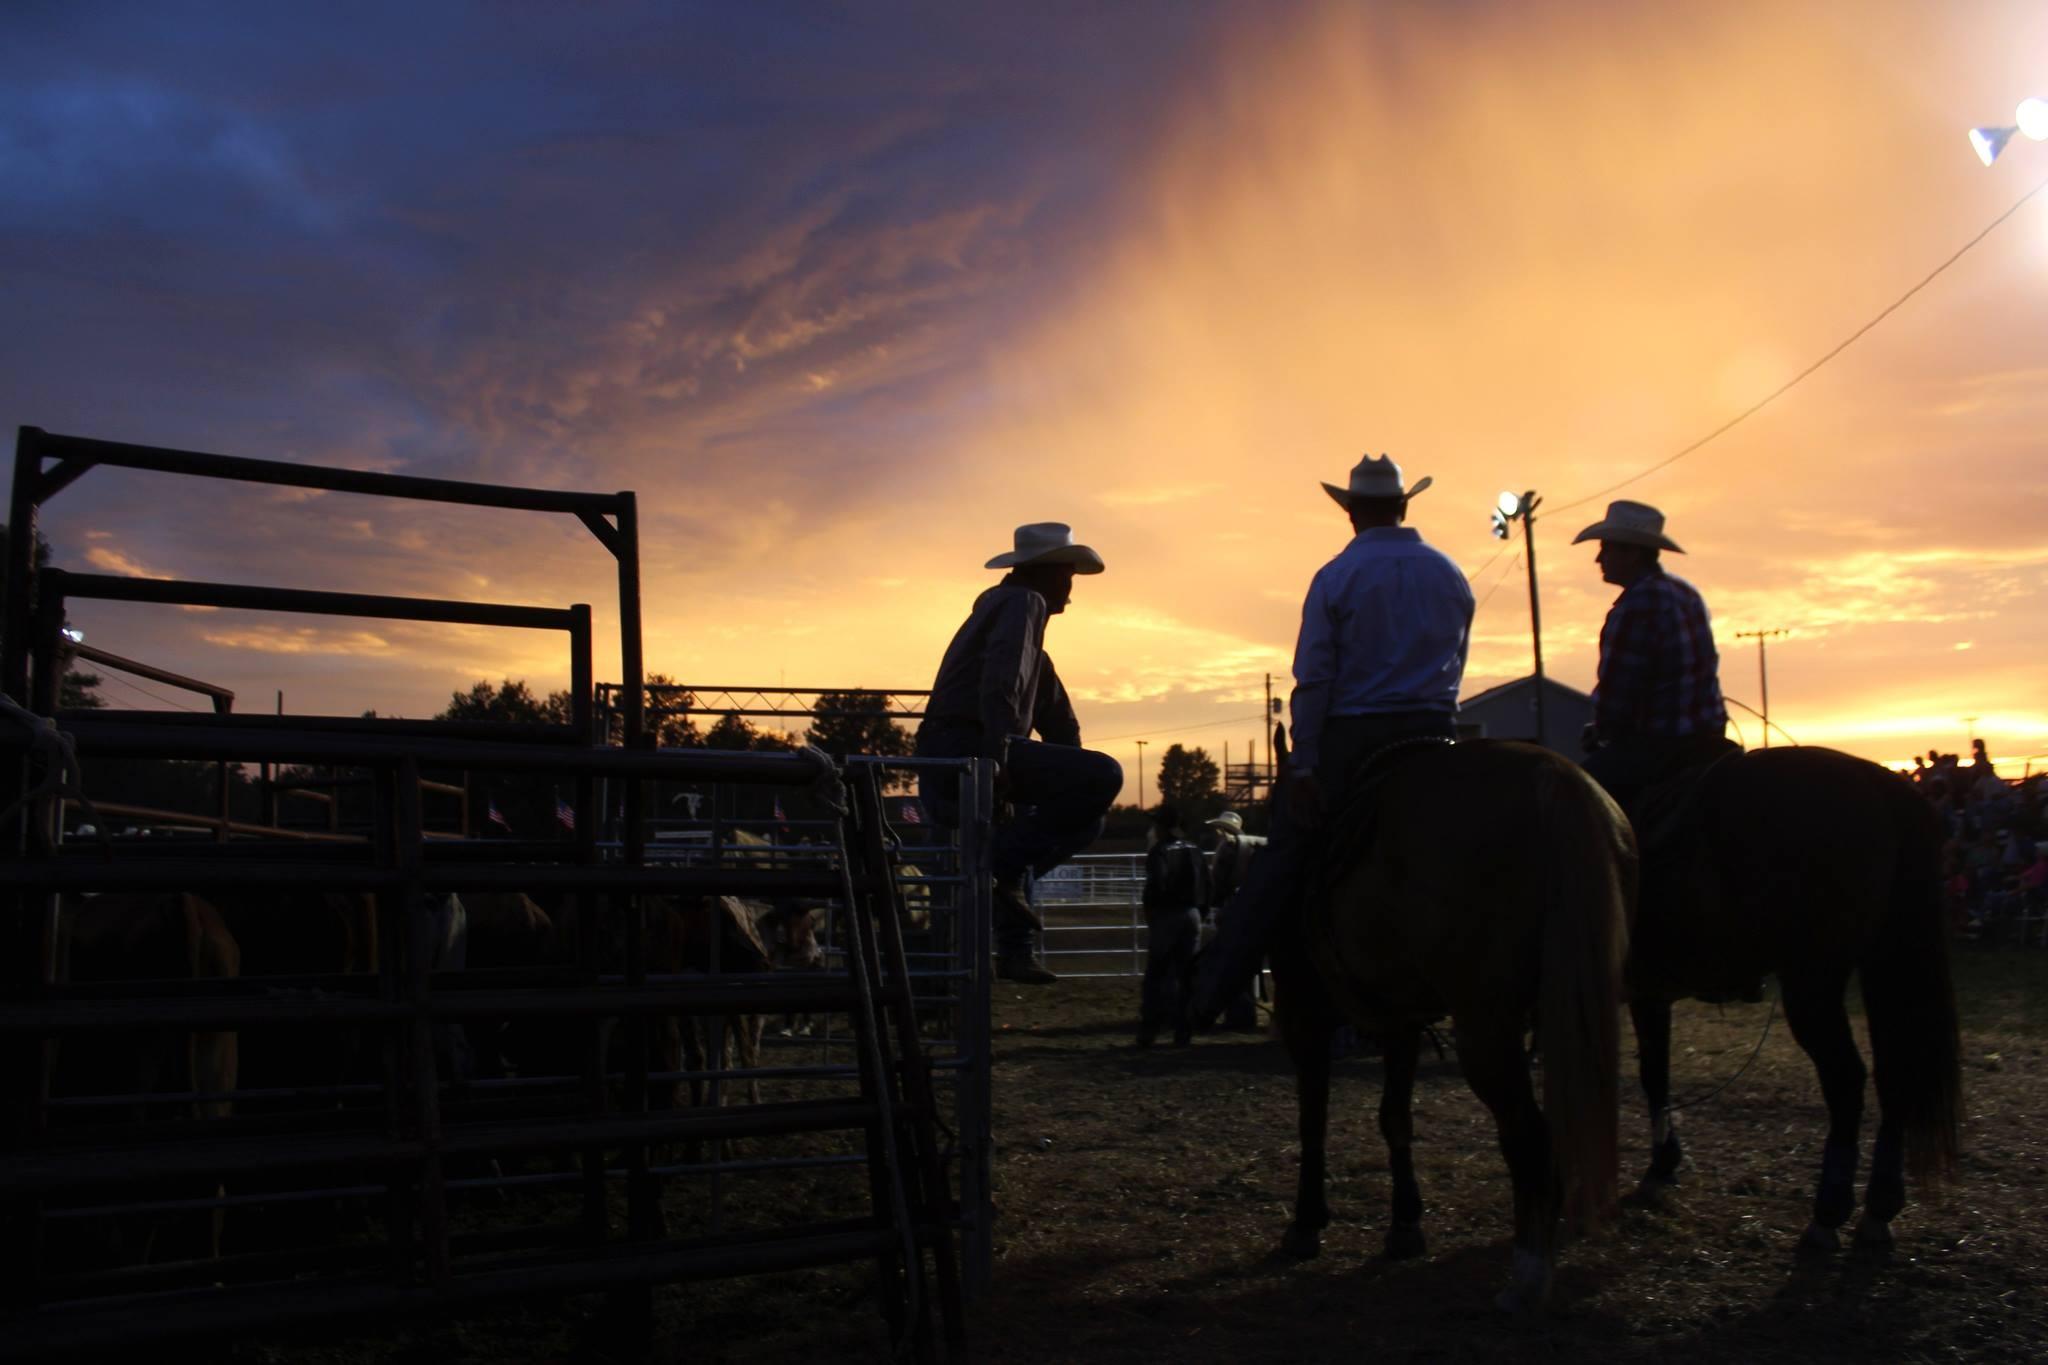 cowboys-1001913